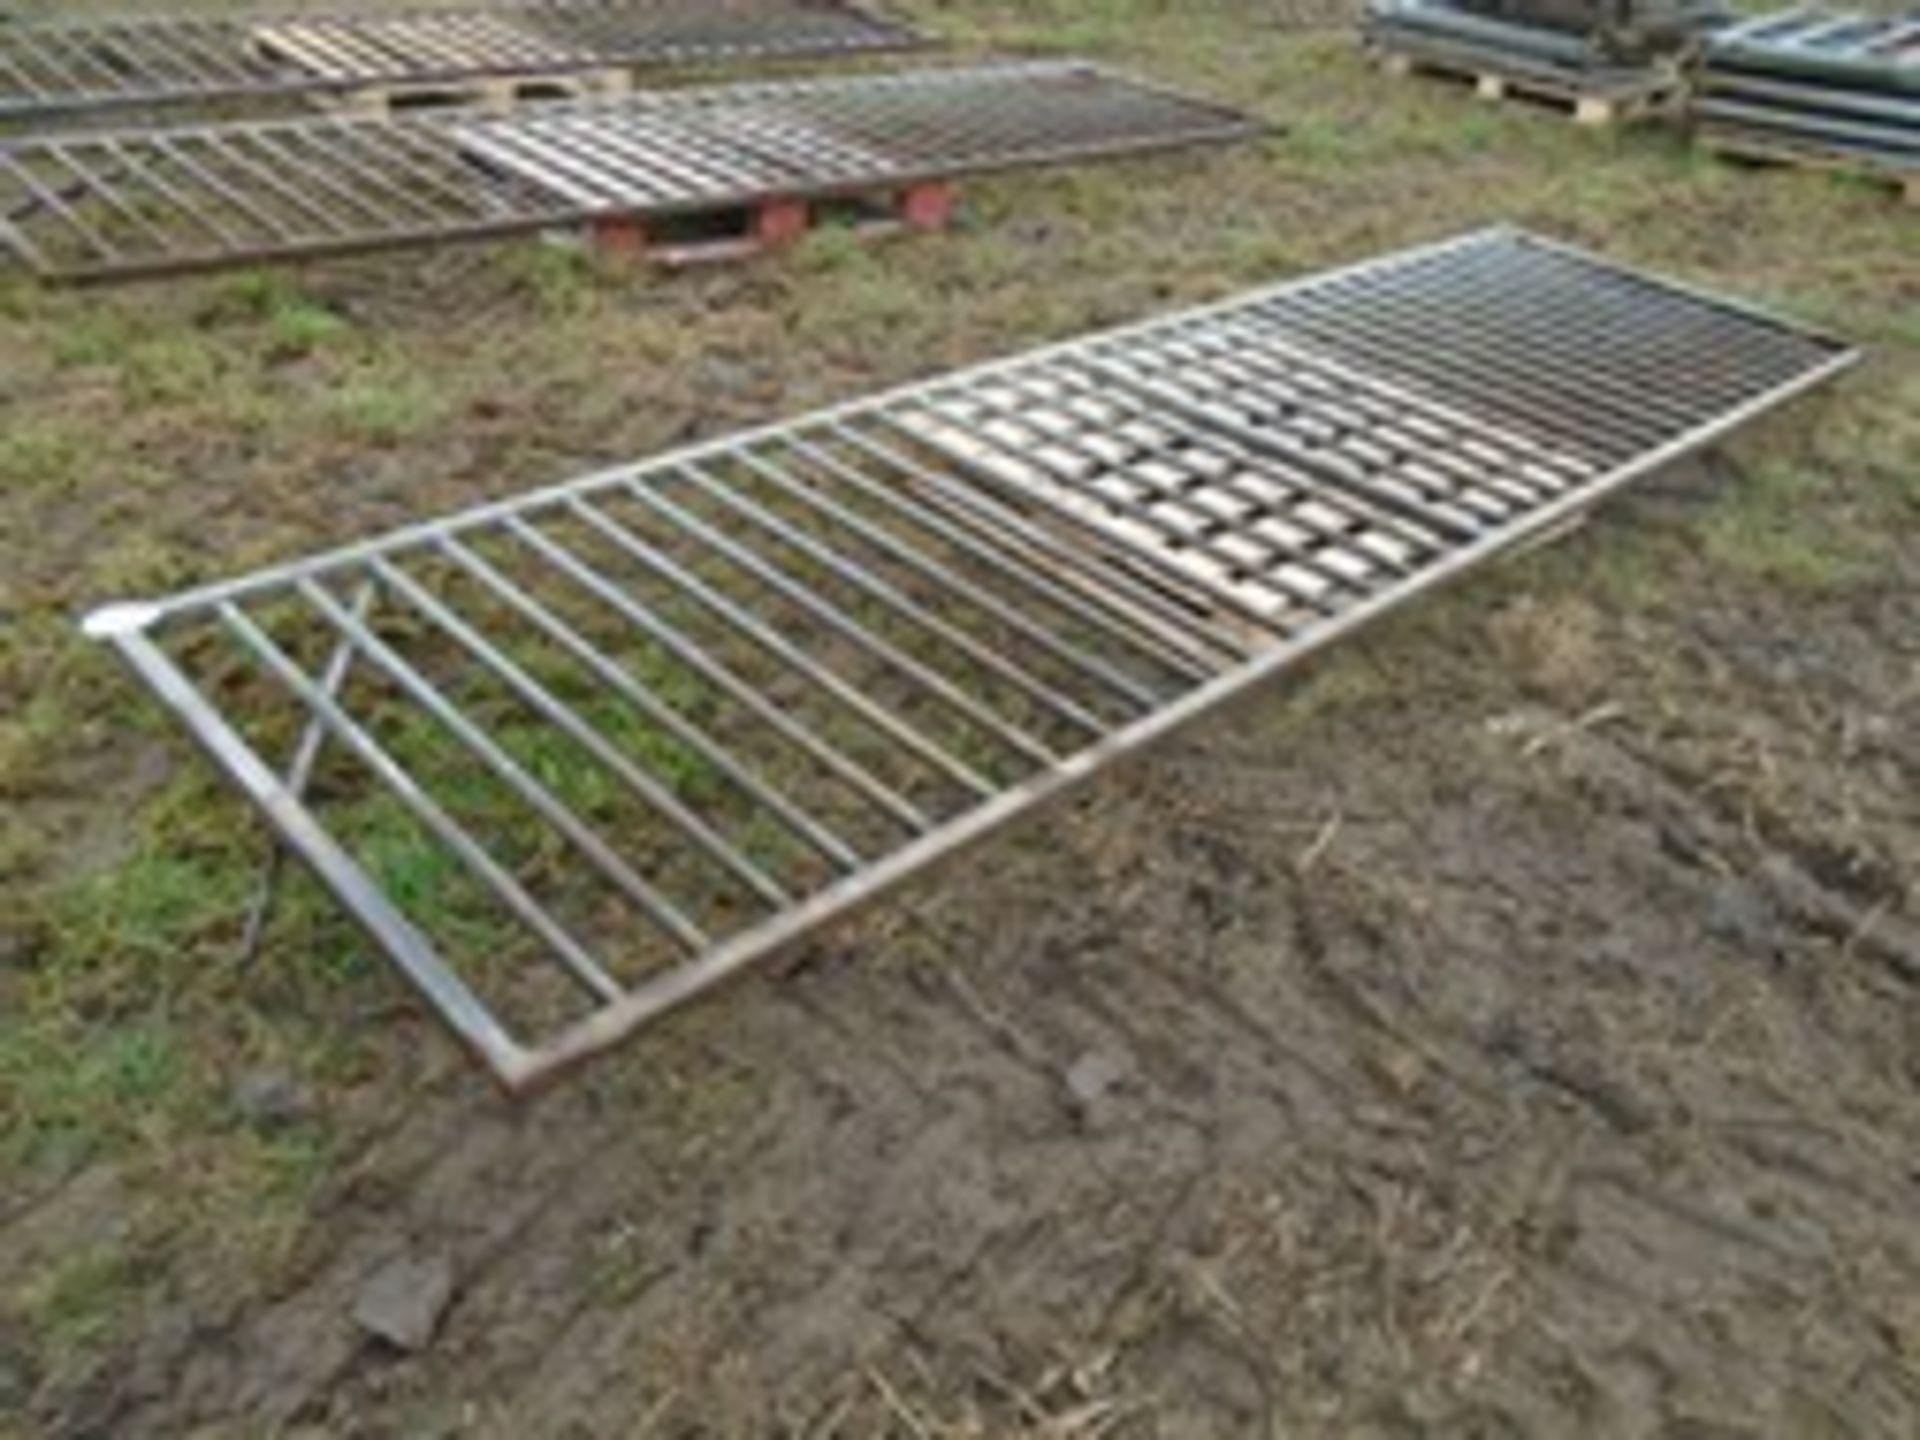 Lot 14 - 14' metal pig gate